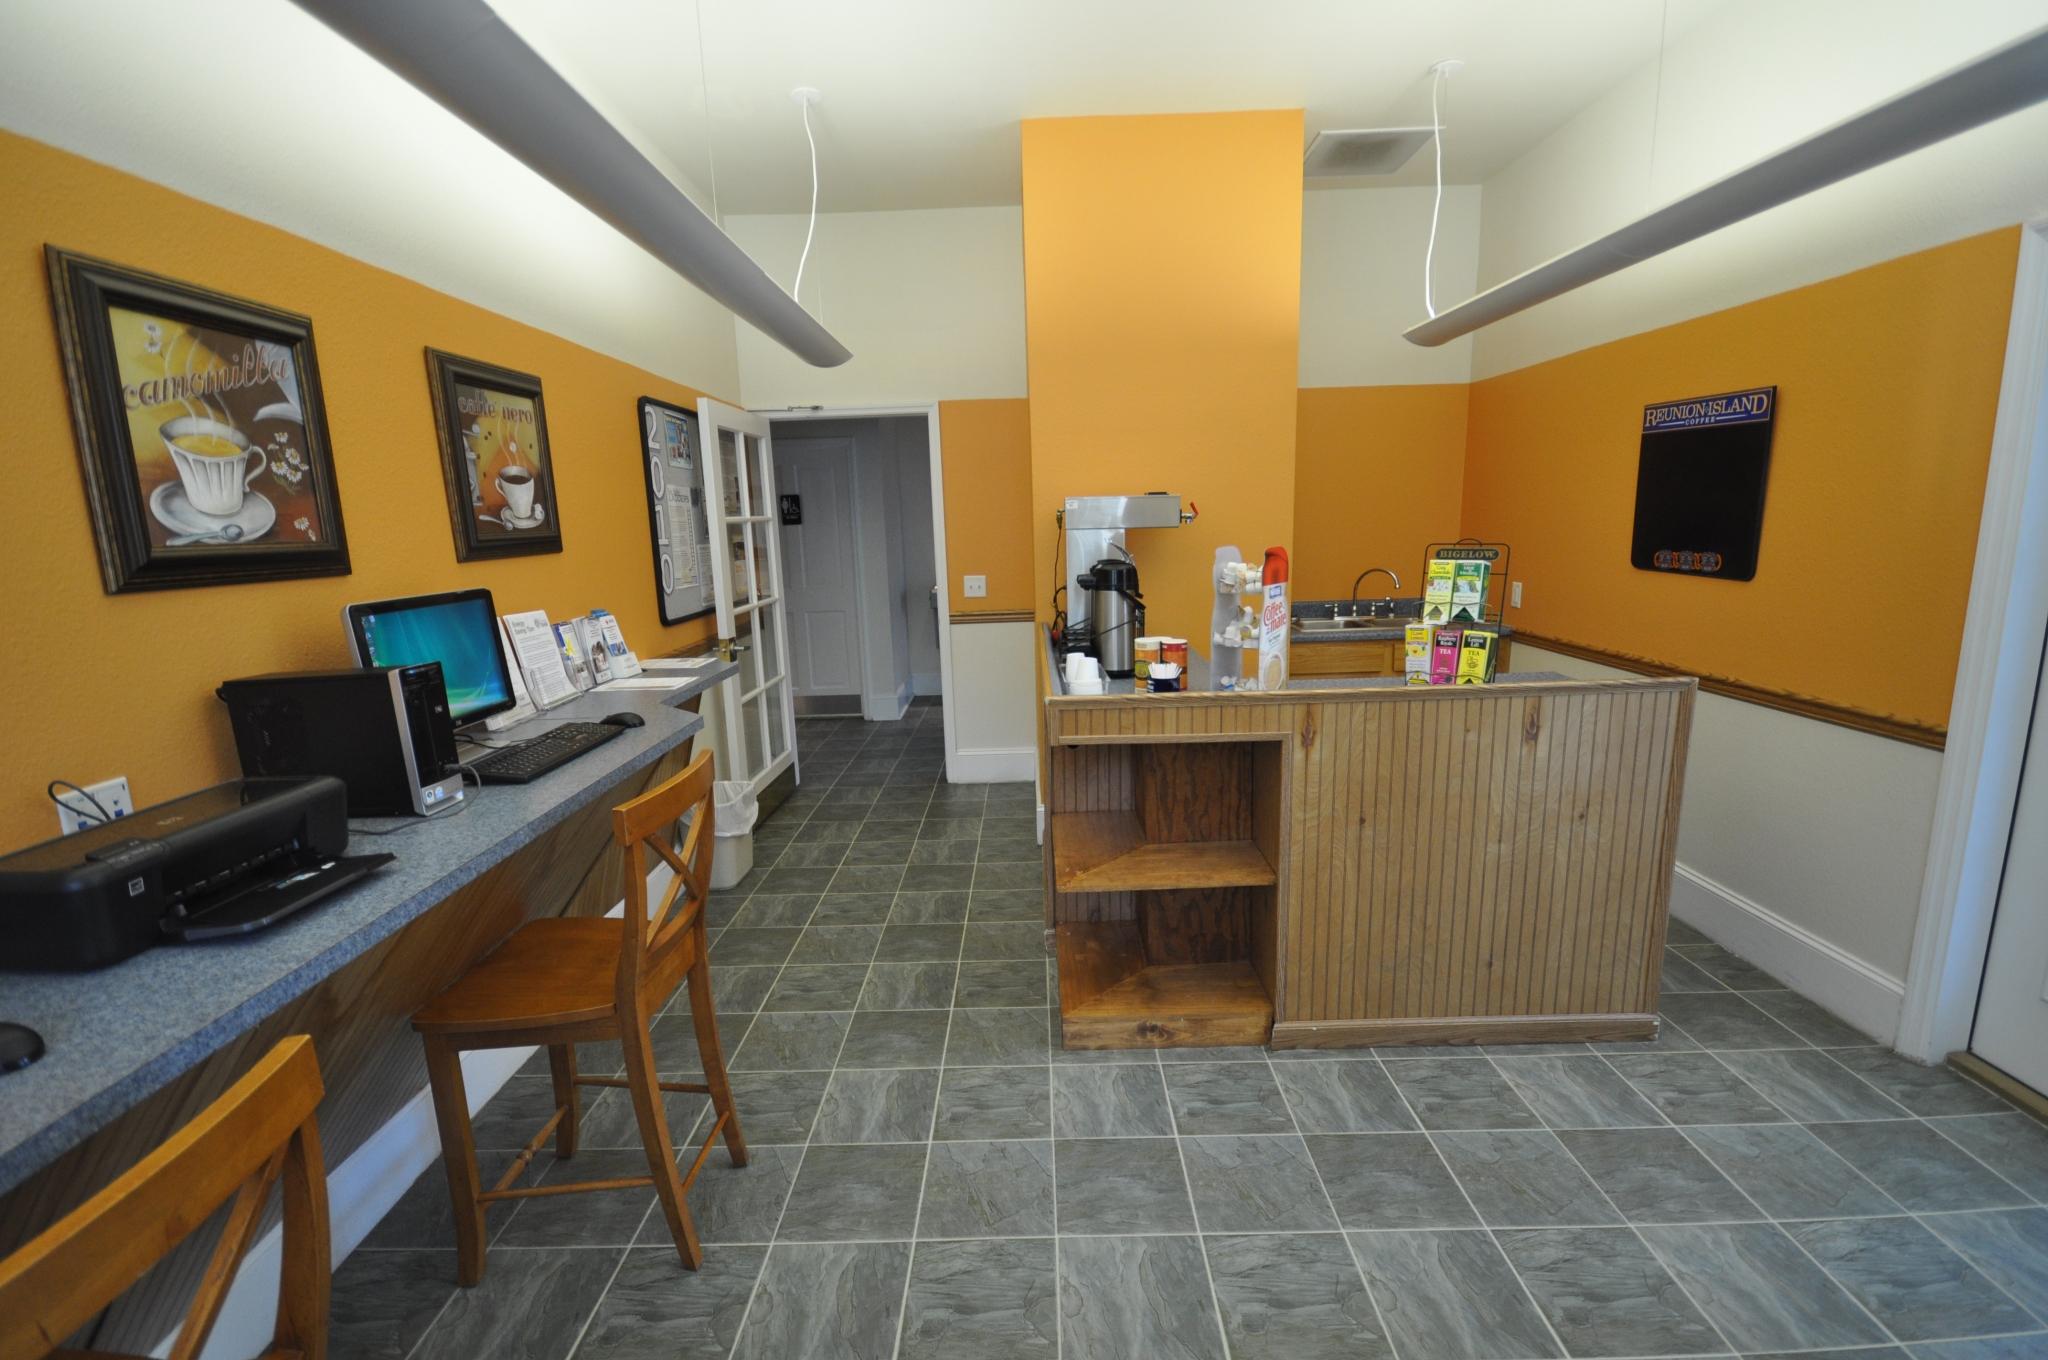 Laurel Bay Business Center | Community Business Center | Office Center for Residents in Beaufort SC